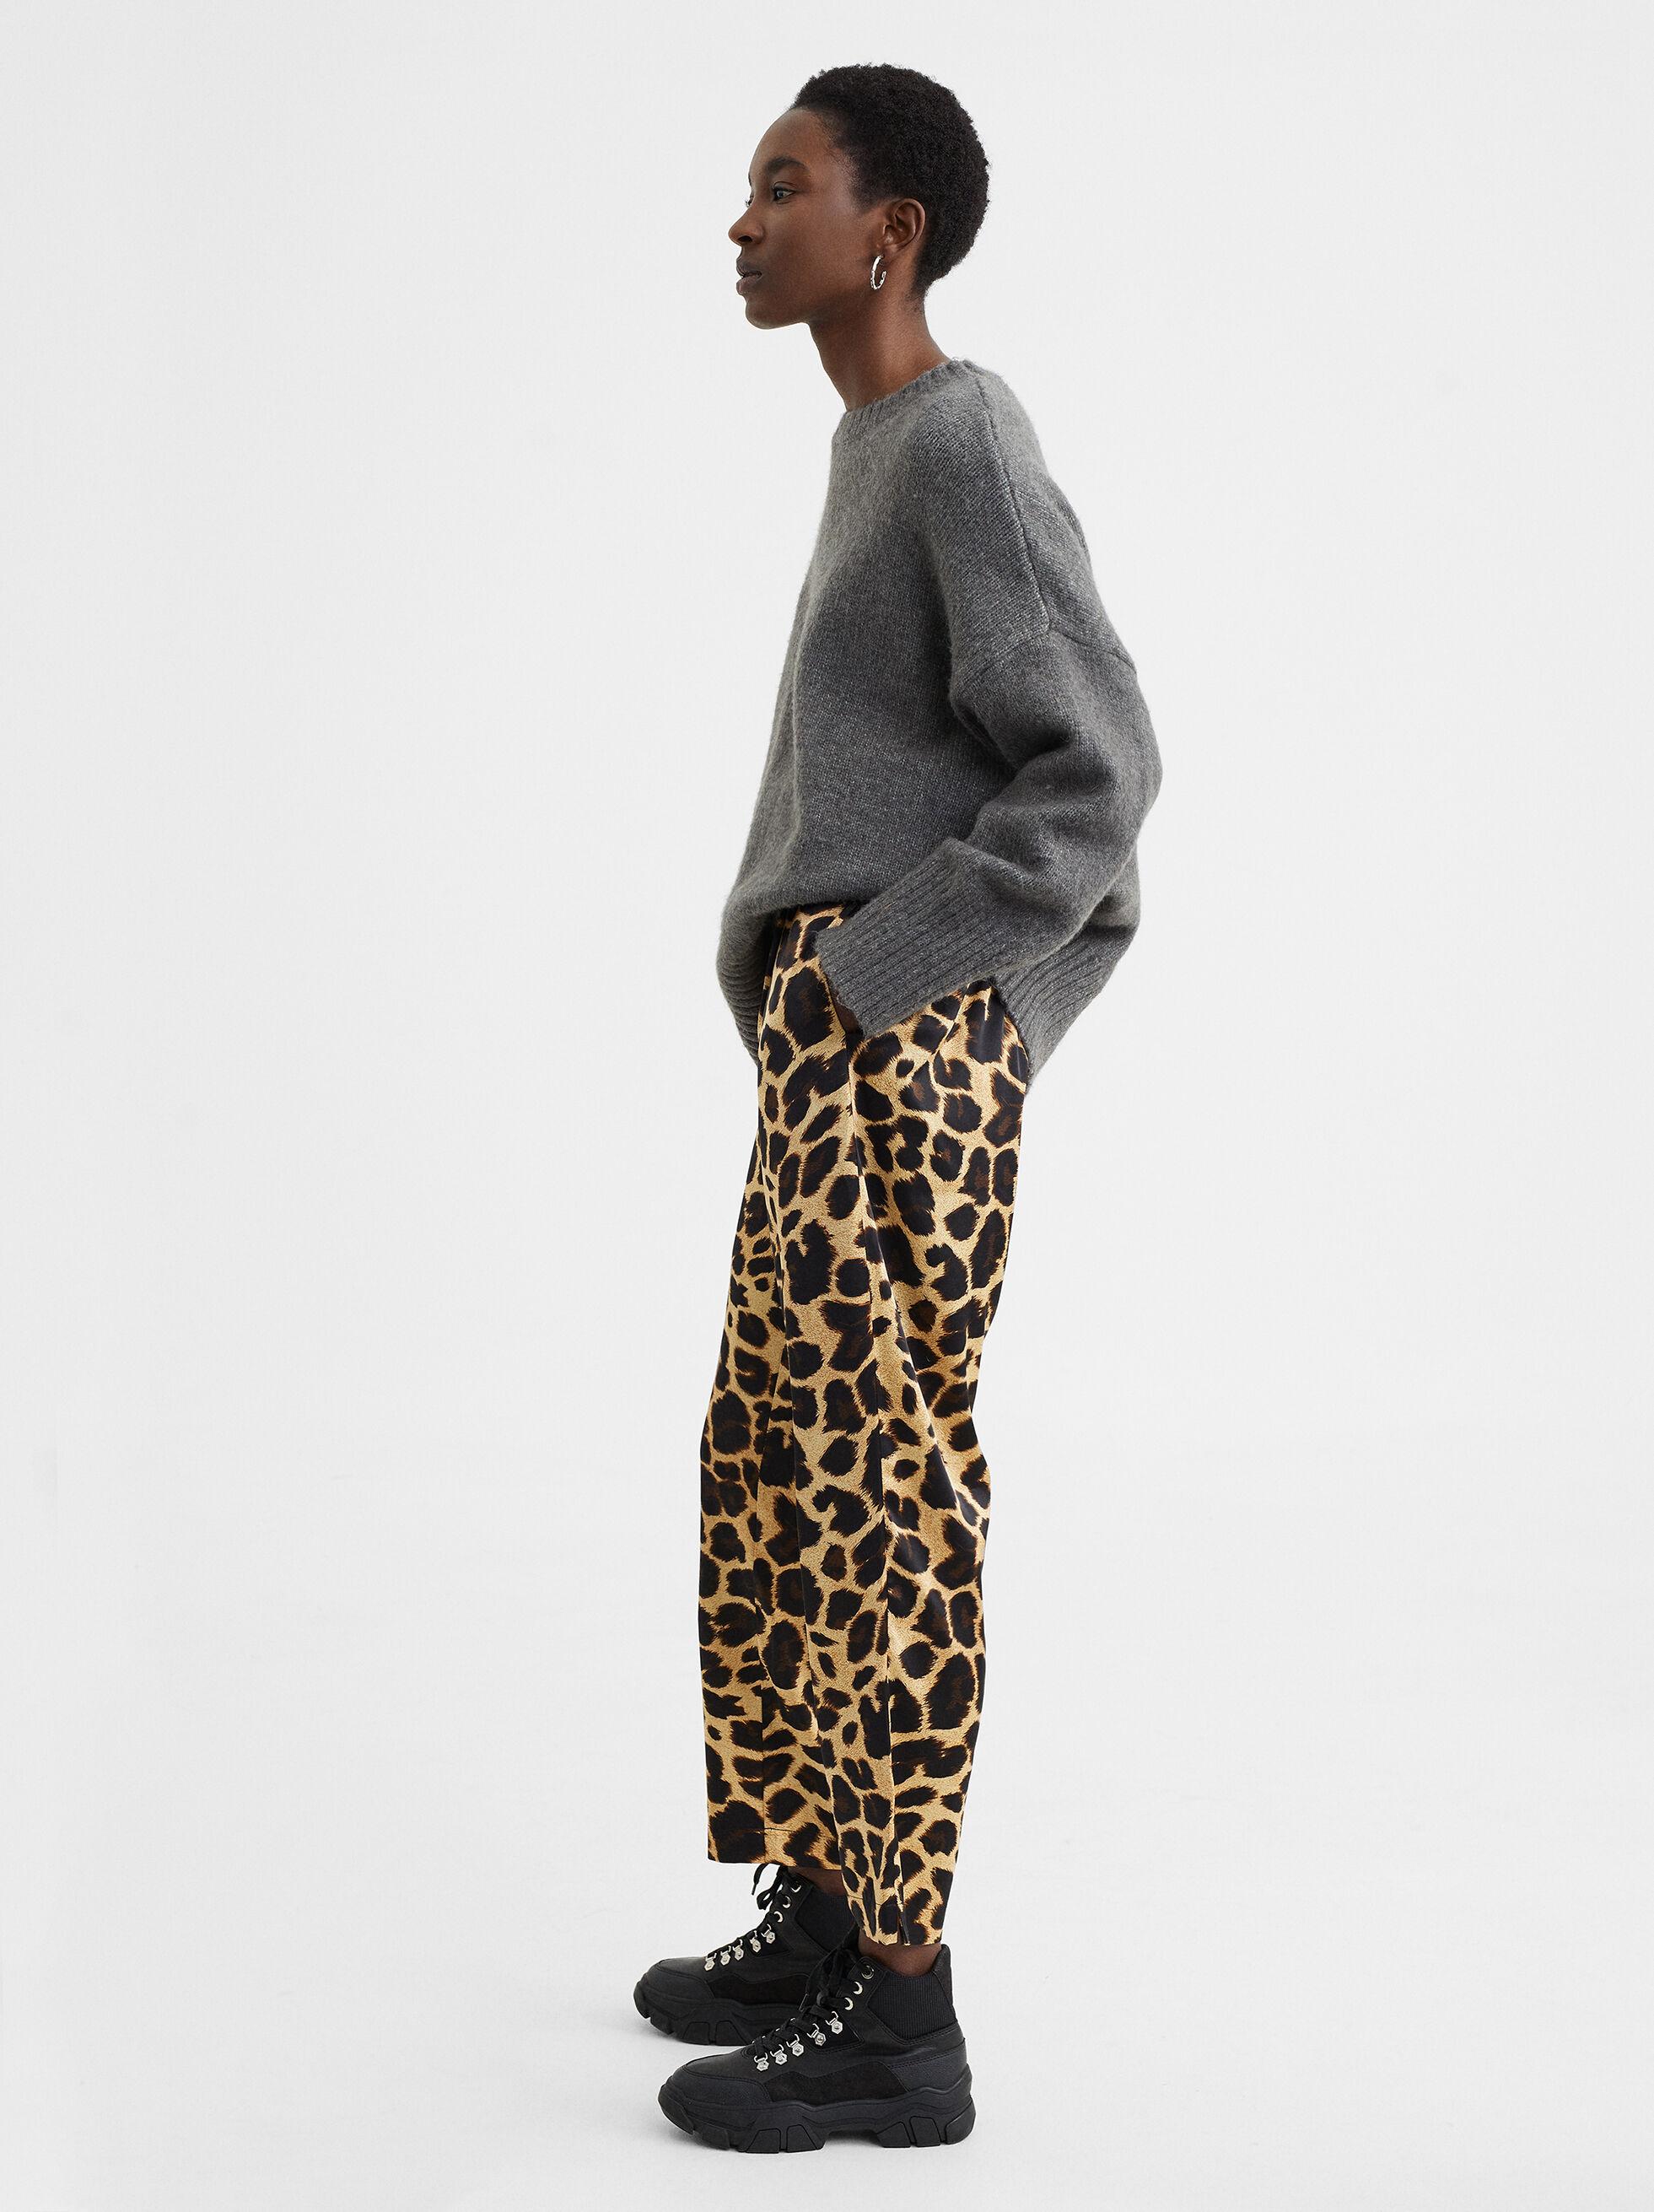 Animal Print Trousers, Golden, hi-res